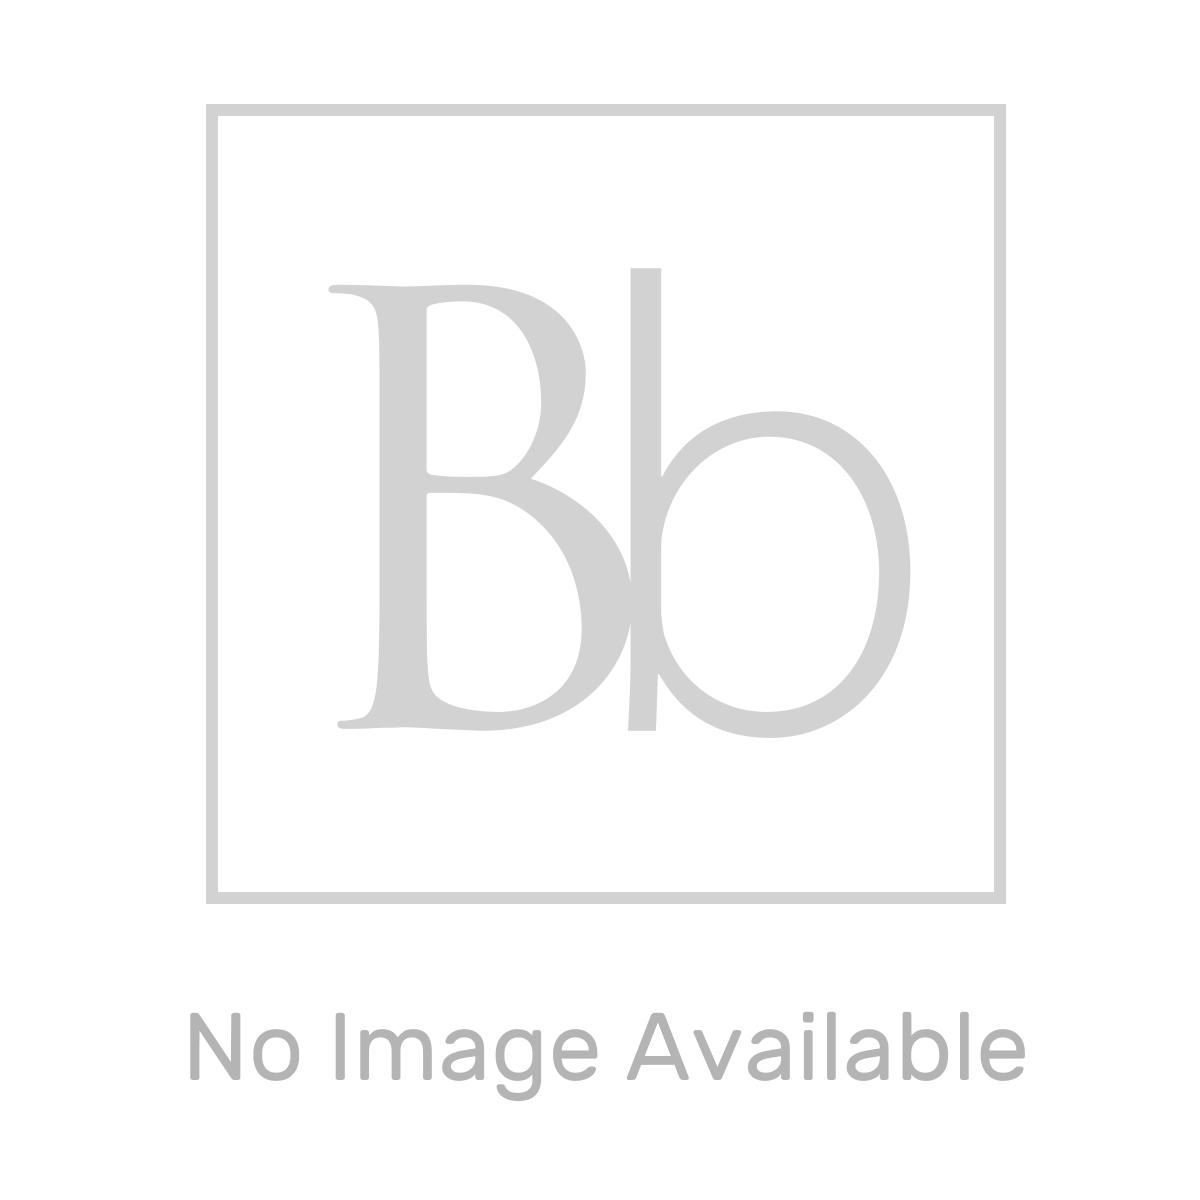 HiB Turbo LED Inline Bathroom Extractor Fan Complete Kit